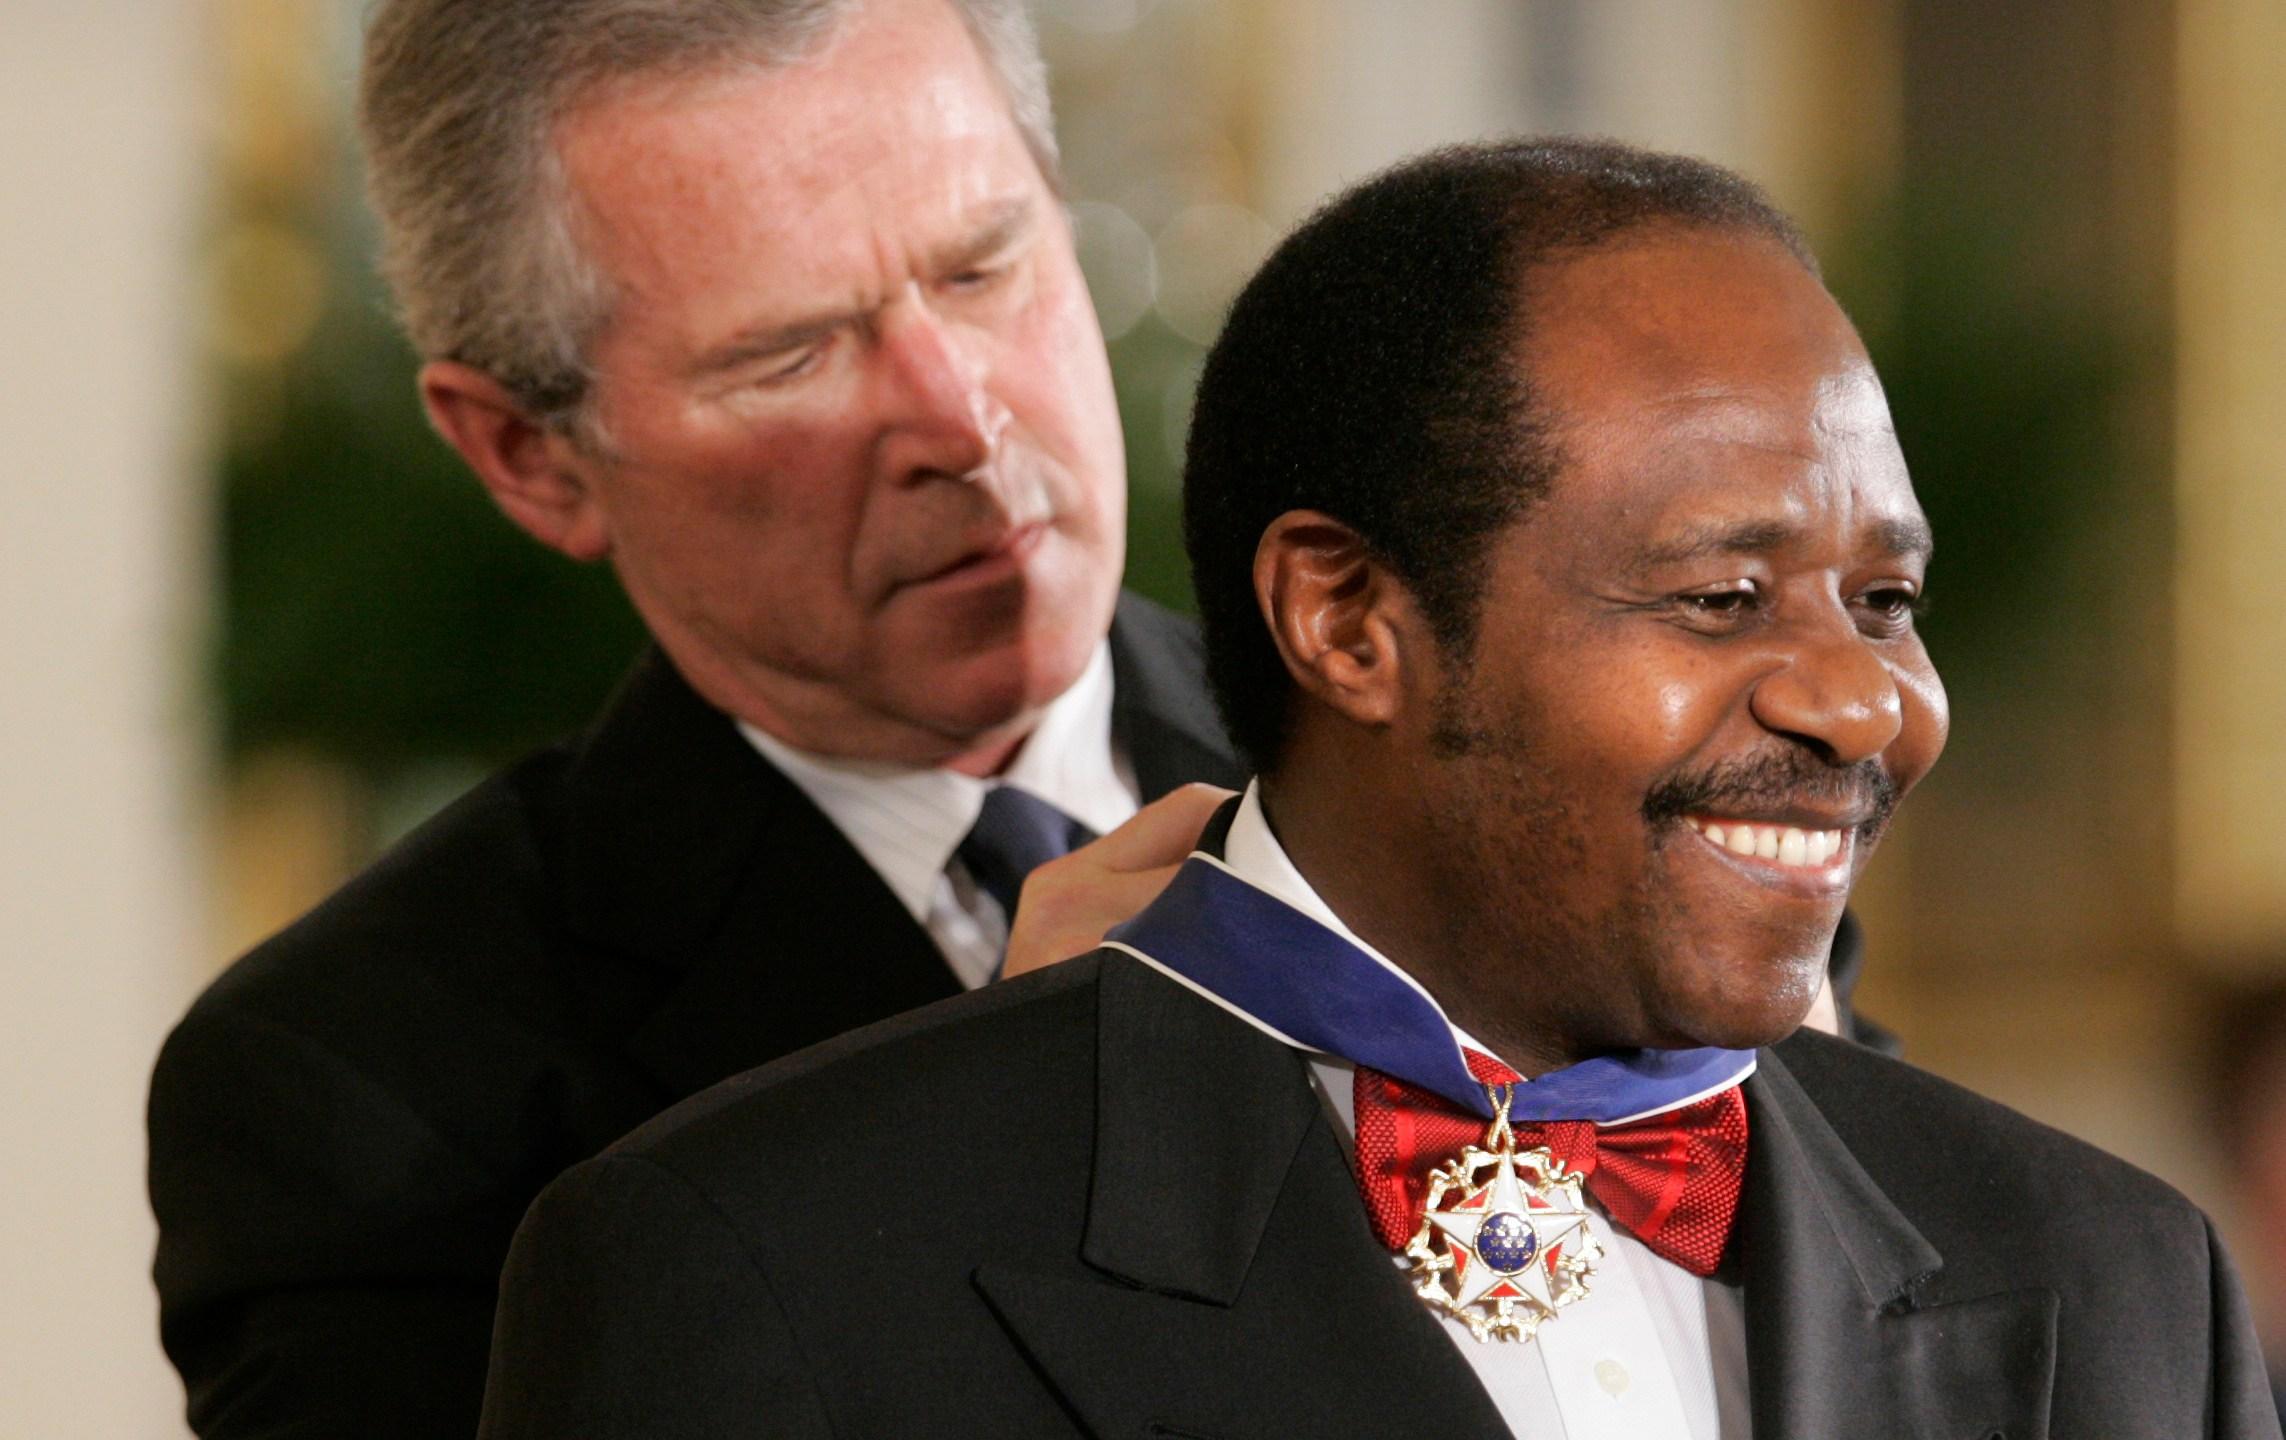 President Bush, Paul Rusesabagina, BUSH RUSESABAGINA